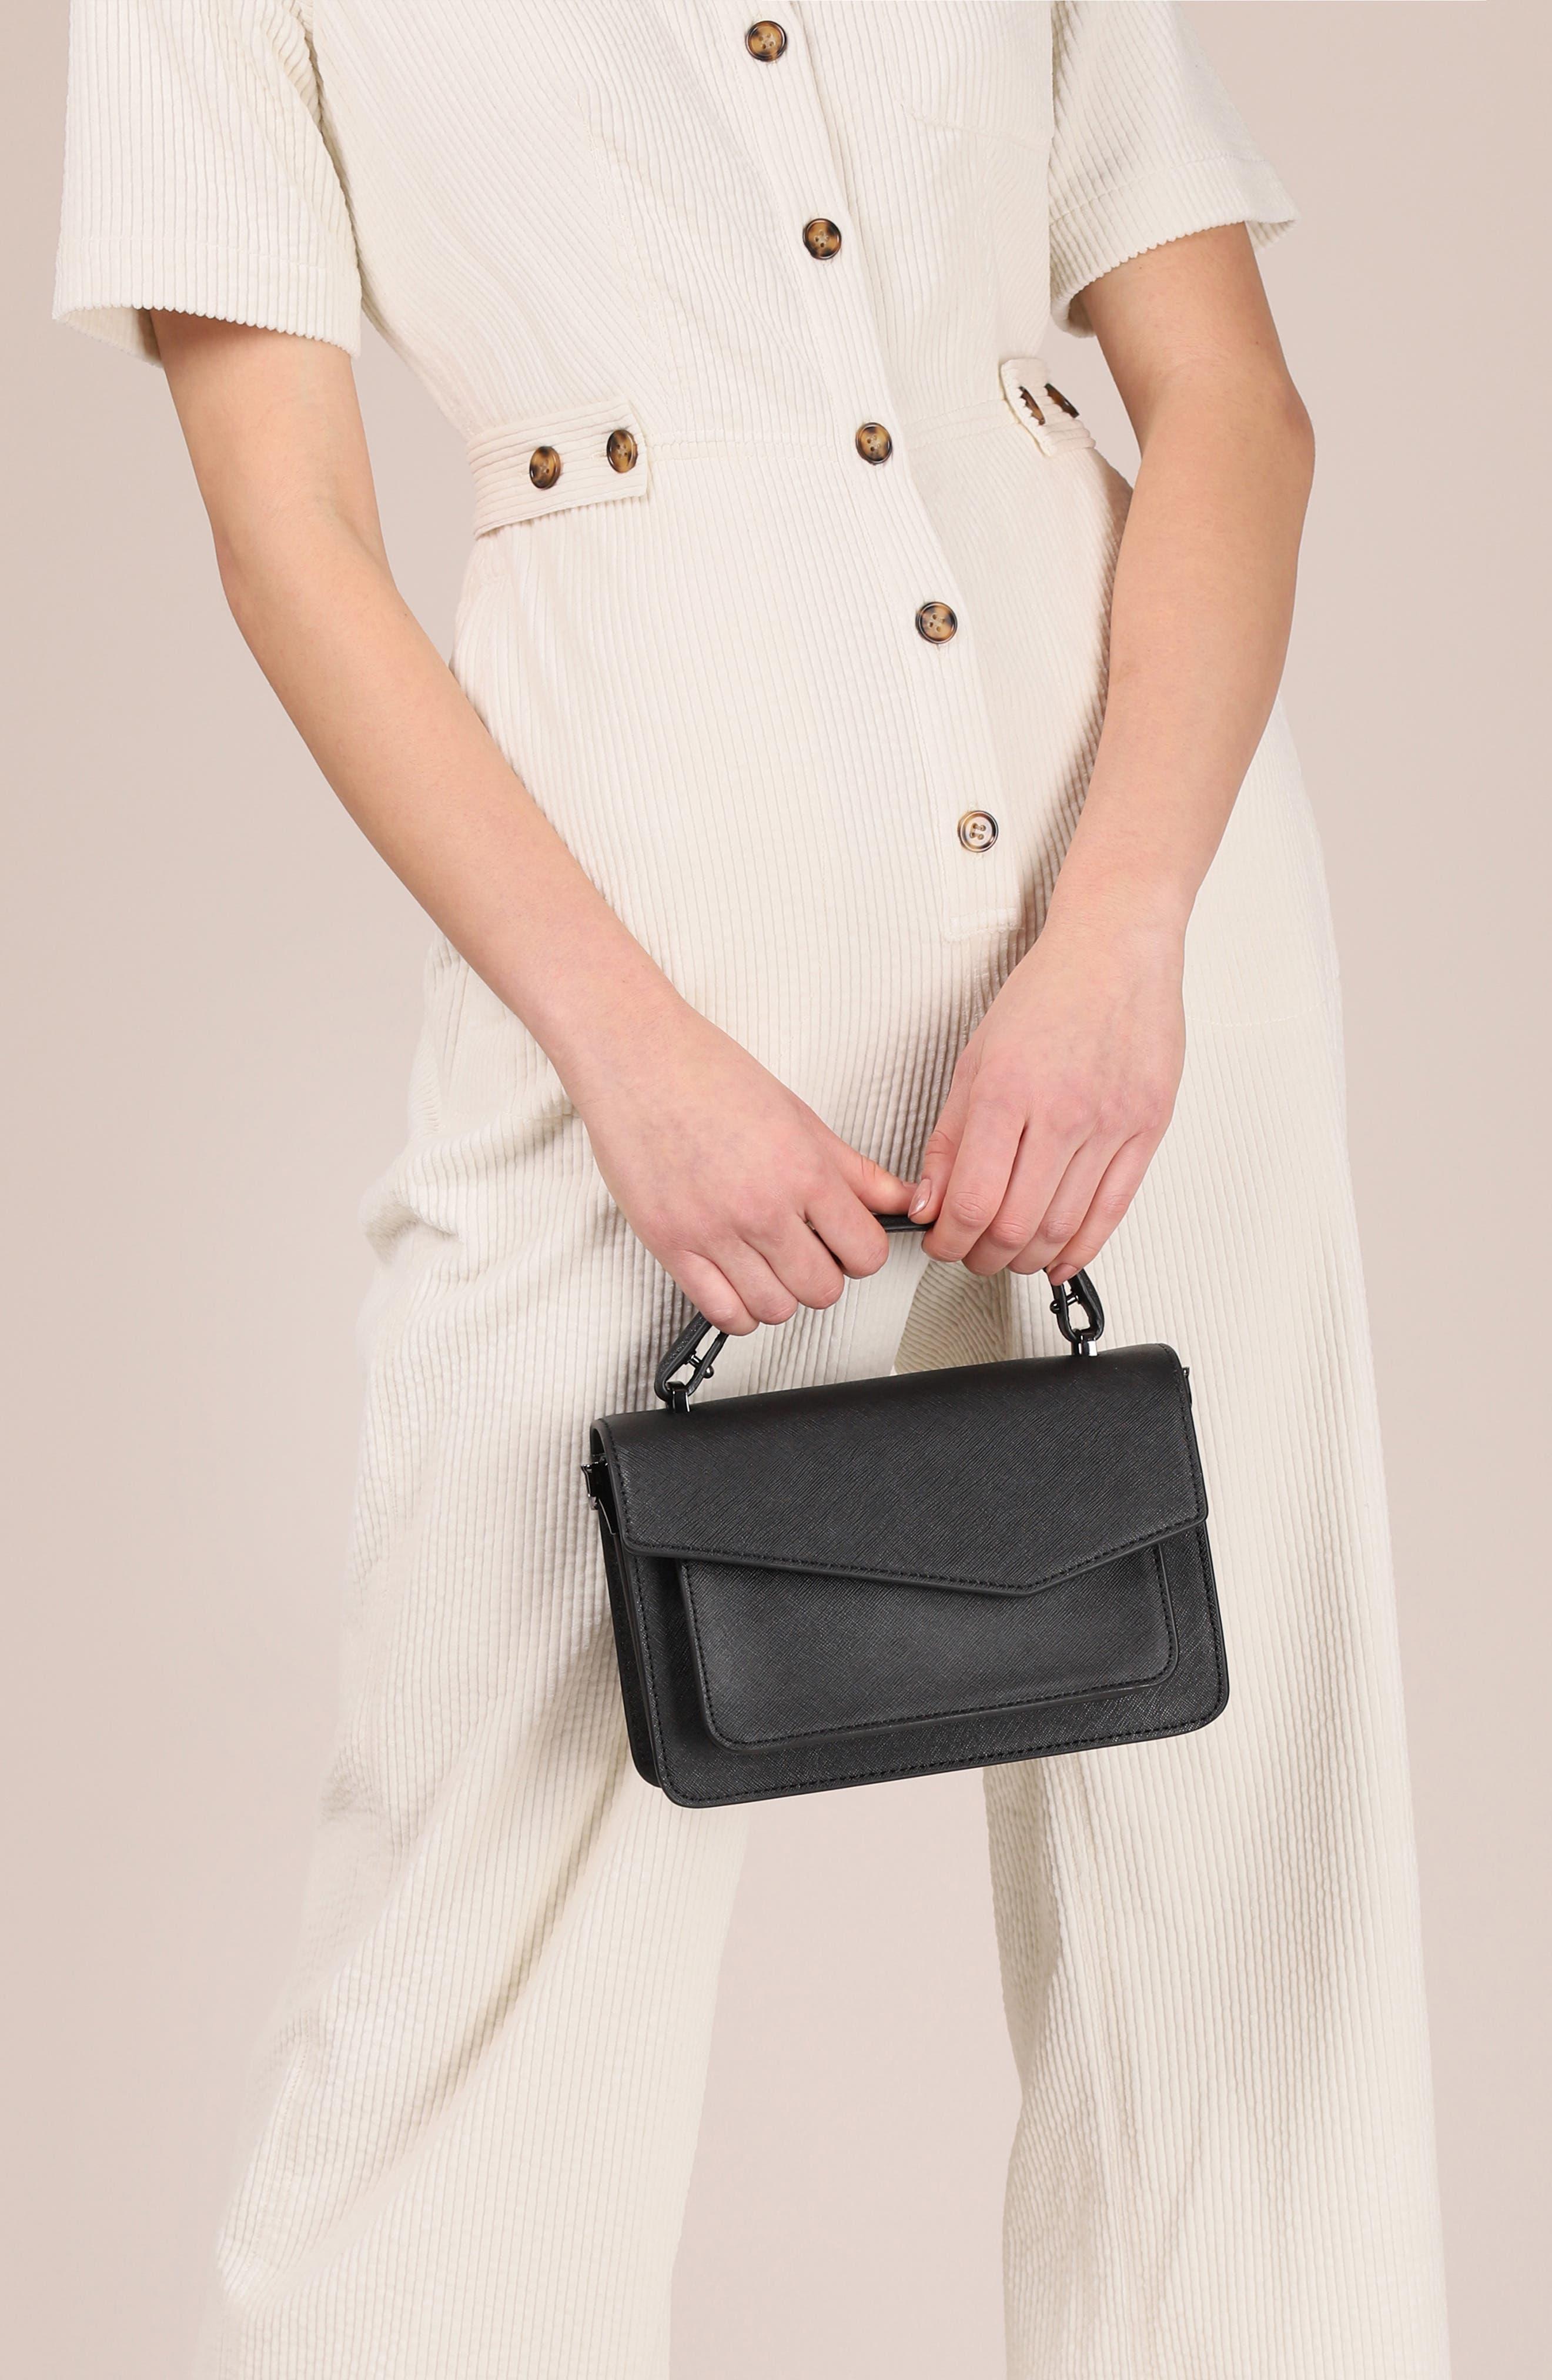 BOTKIER, Cobble Hill Leather Crossbody Bag, Alternate thumbnail 4, color, BLACK